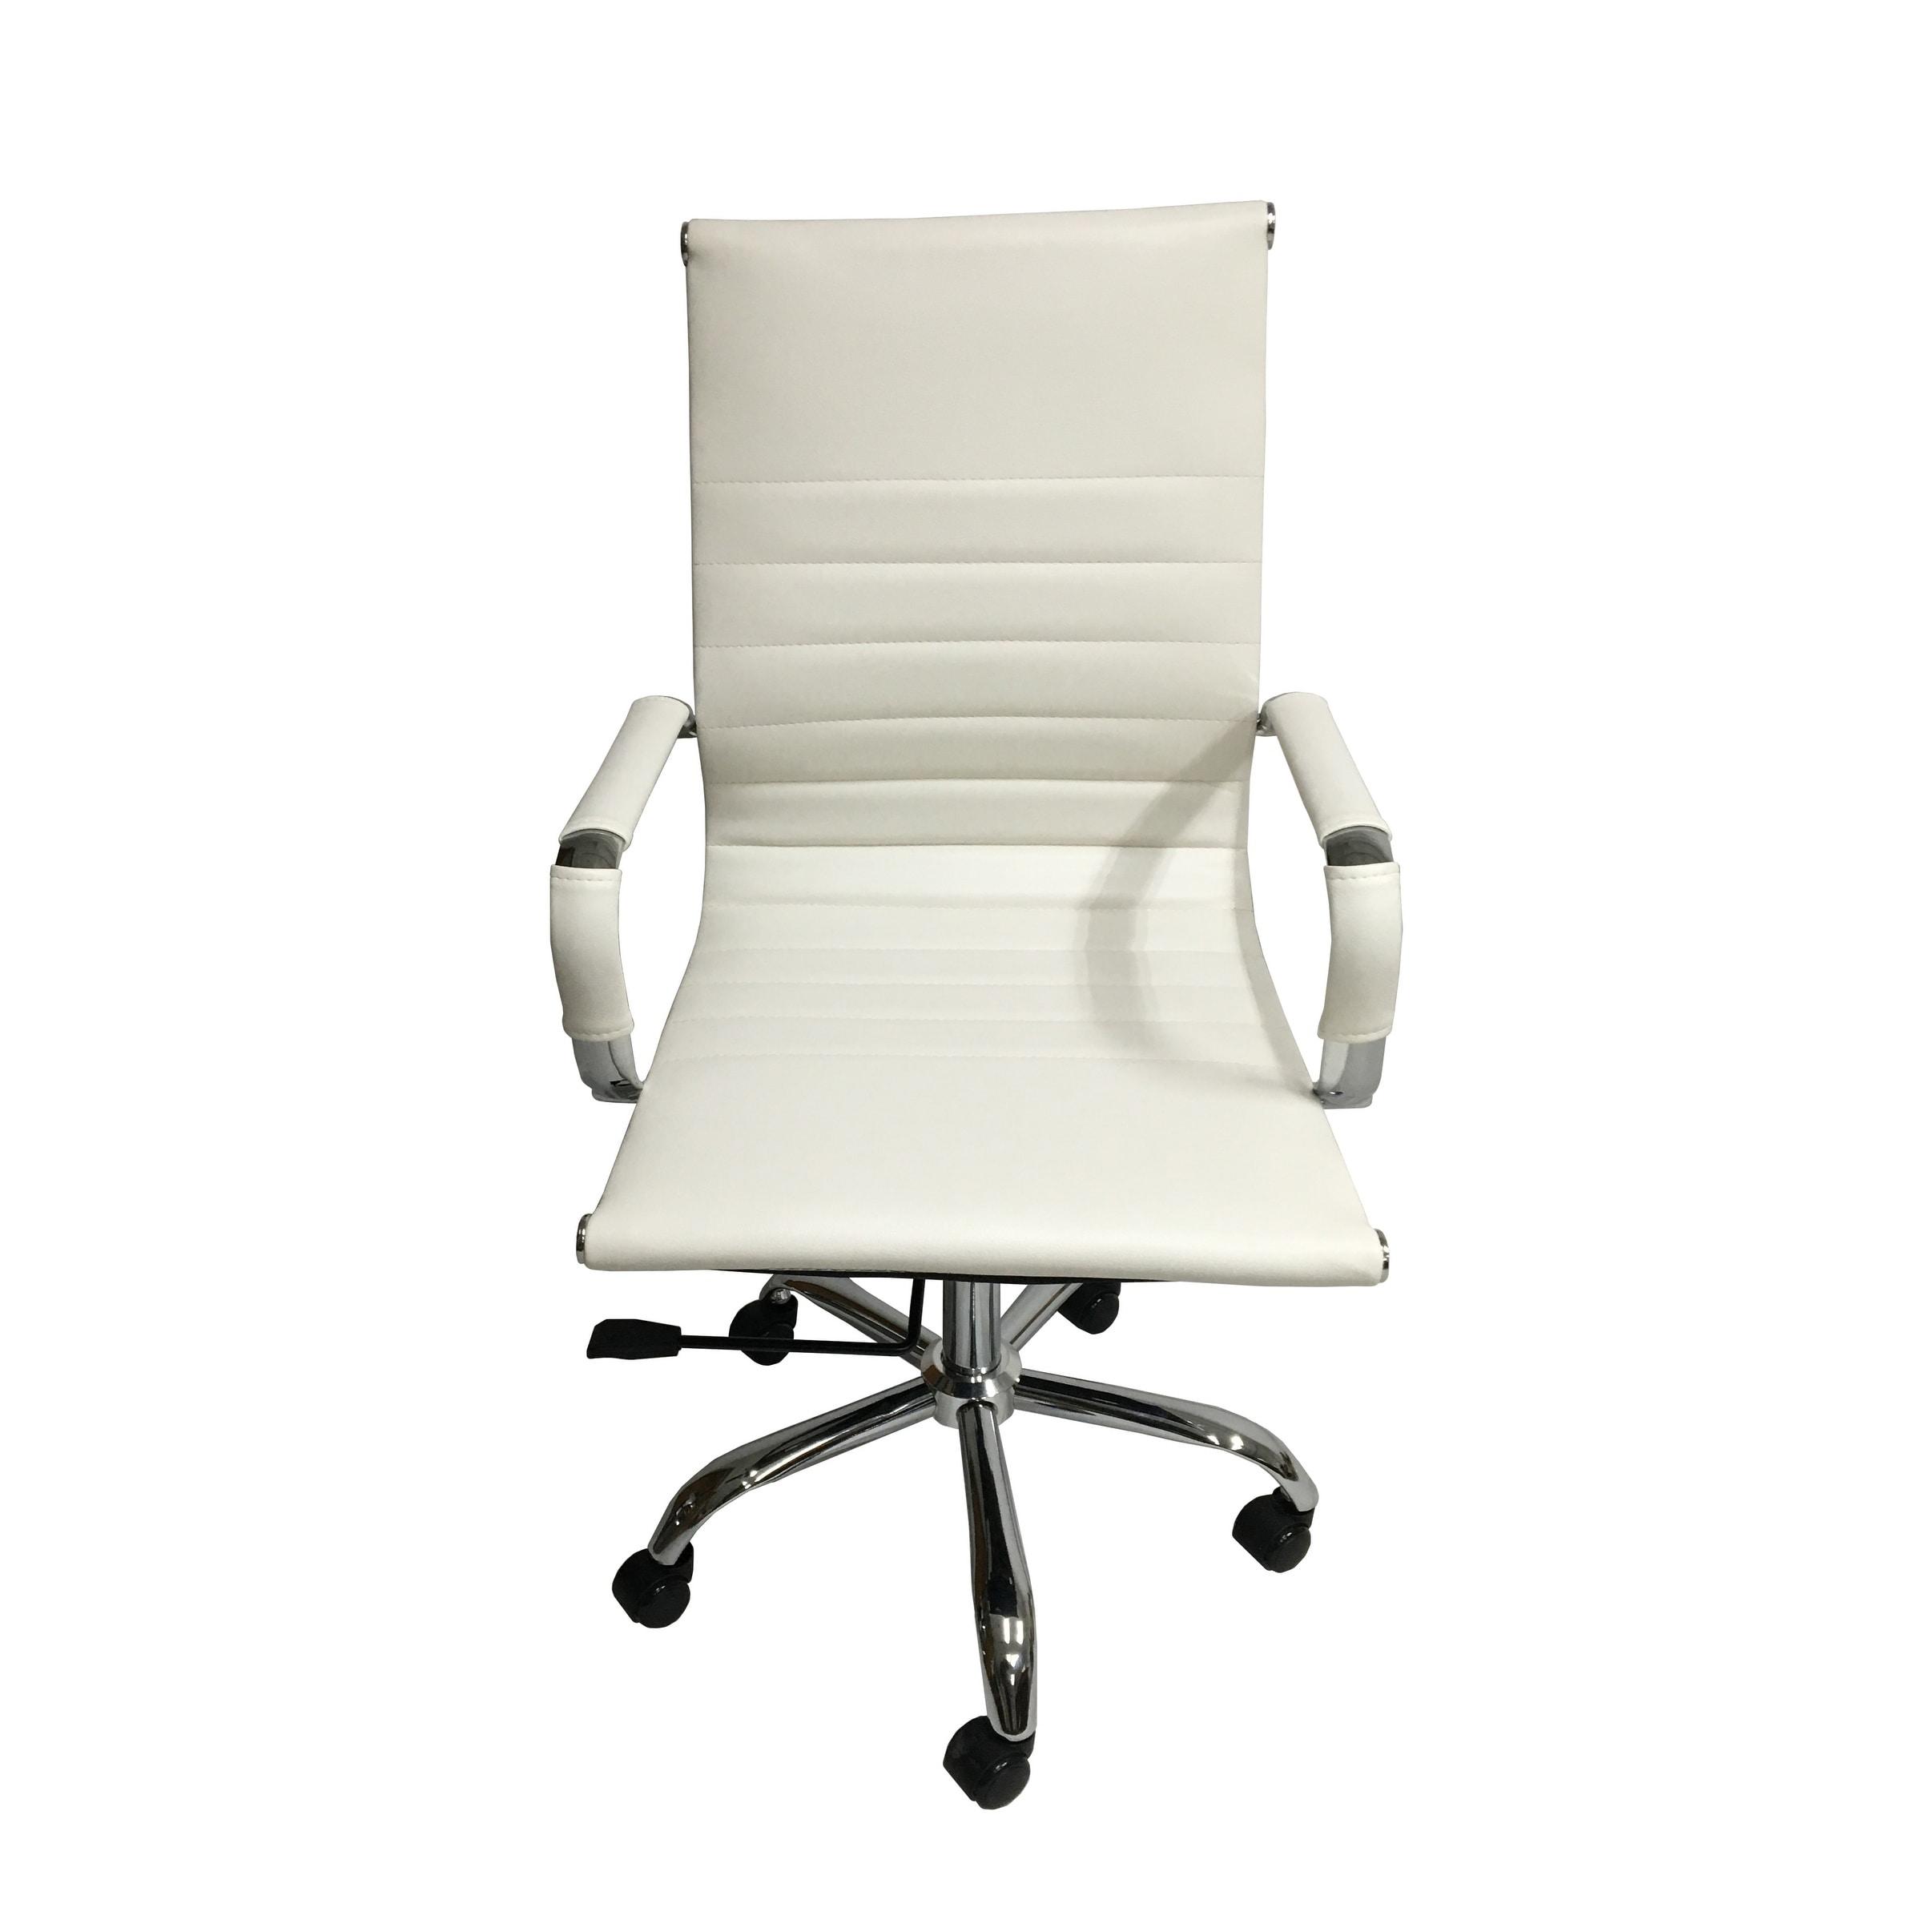 Arizona Office Chair White Gel Leather